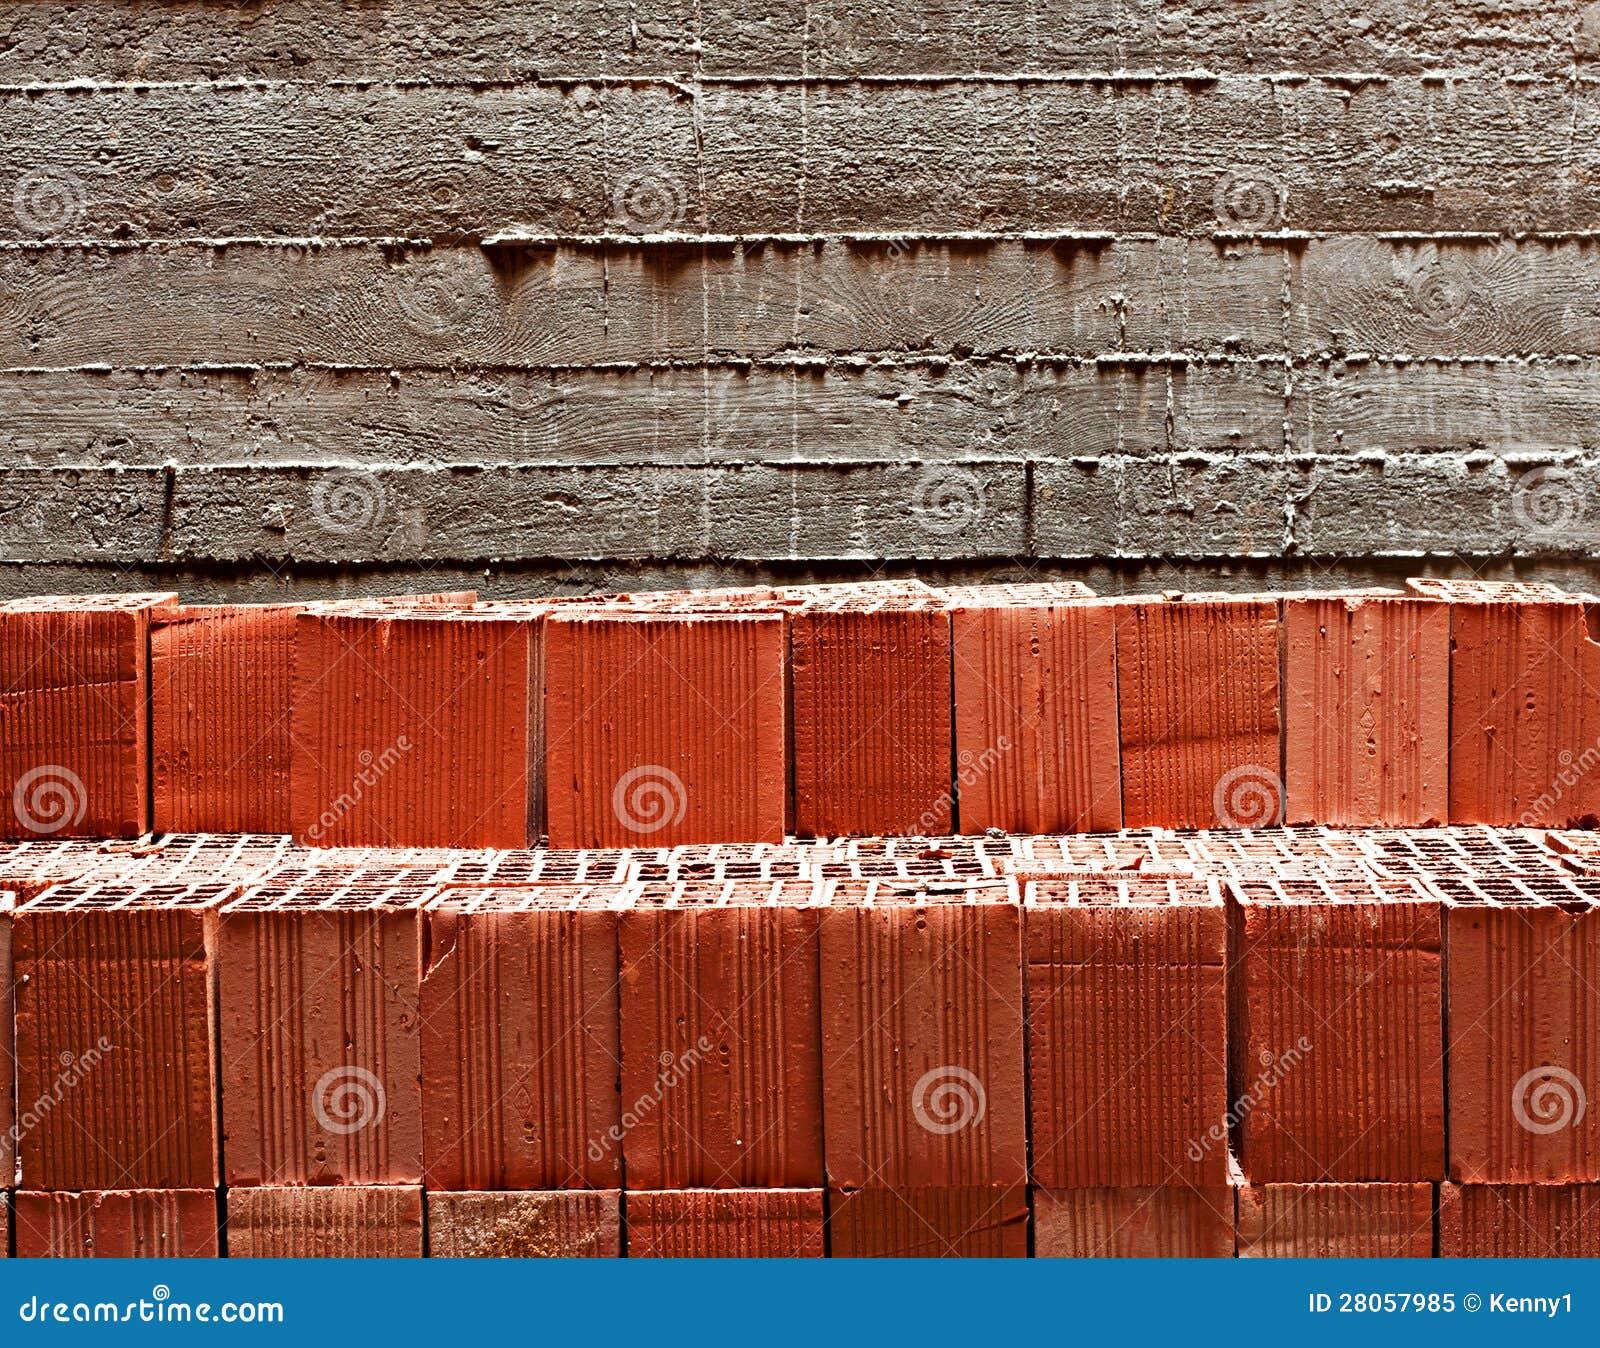 stapel rote bausteine stockbild bild von bl cke stapel 28057985